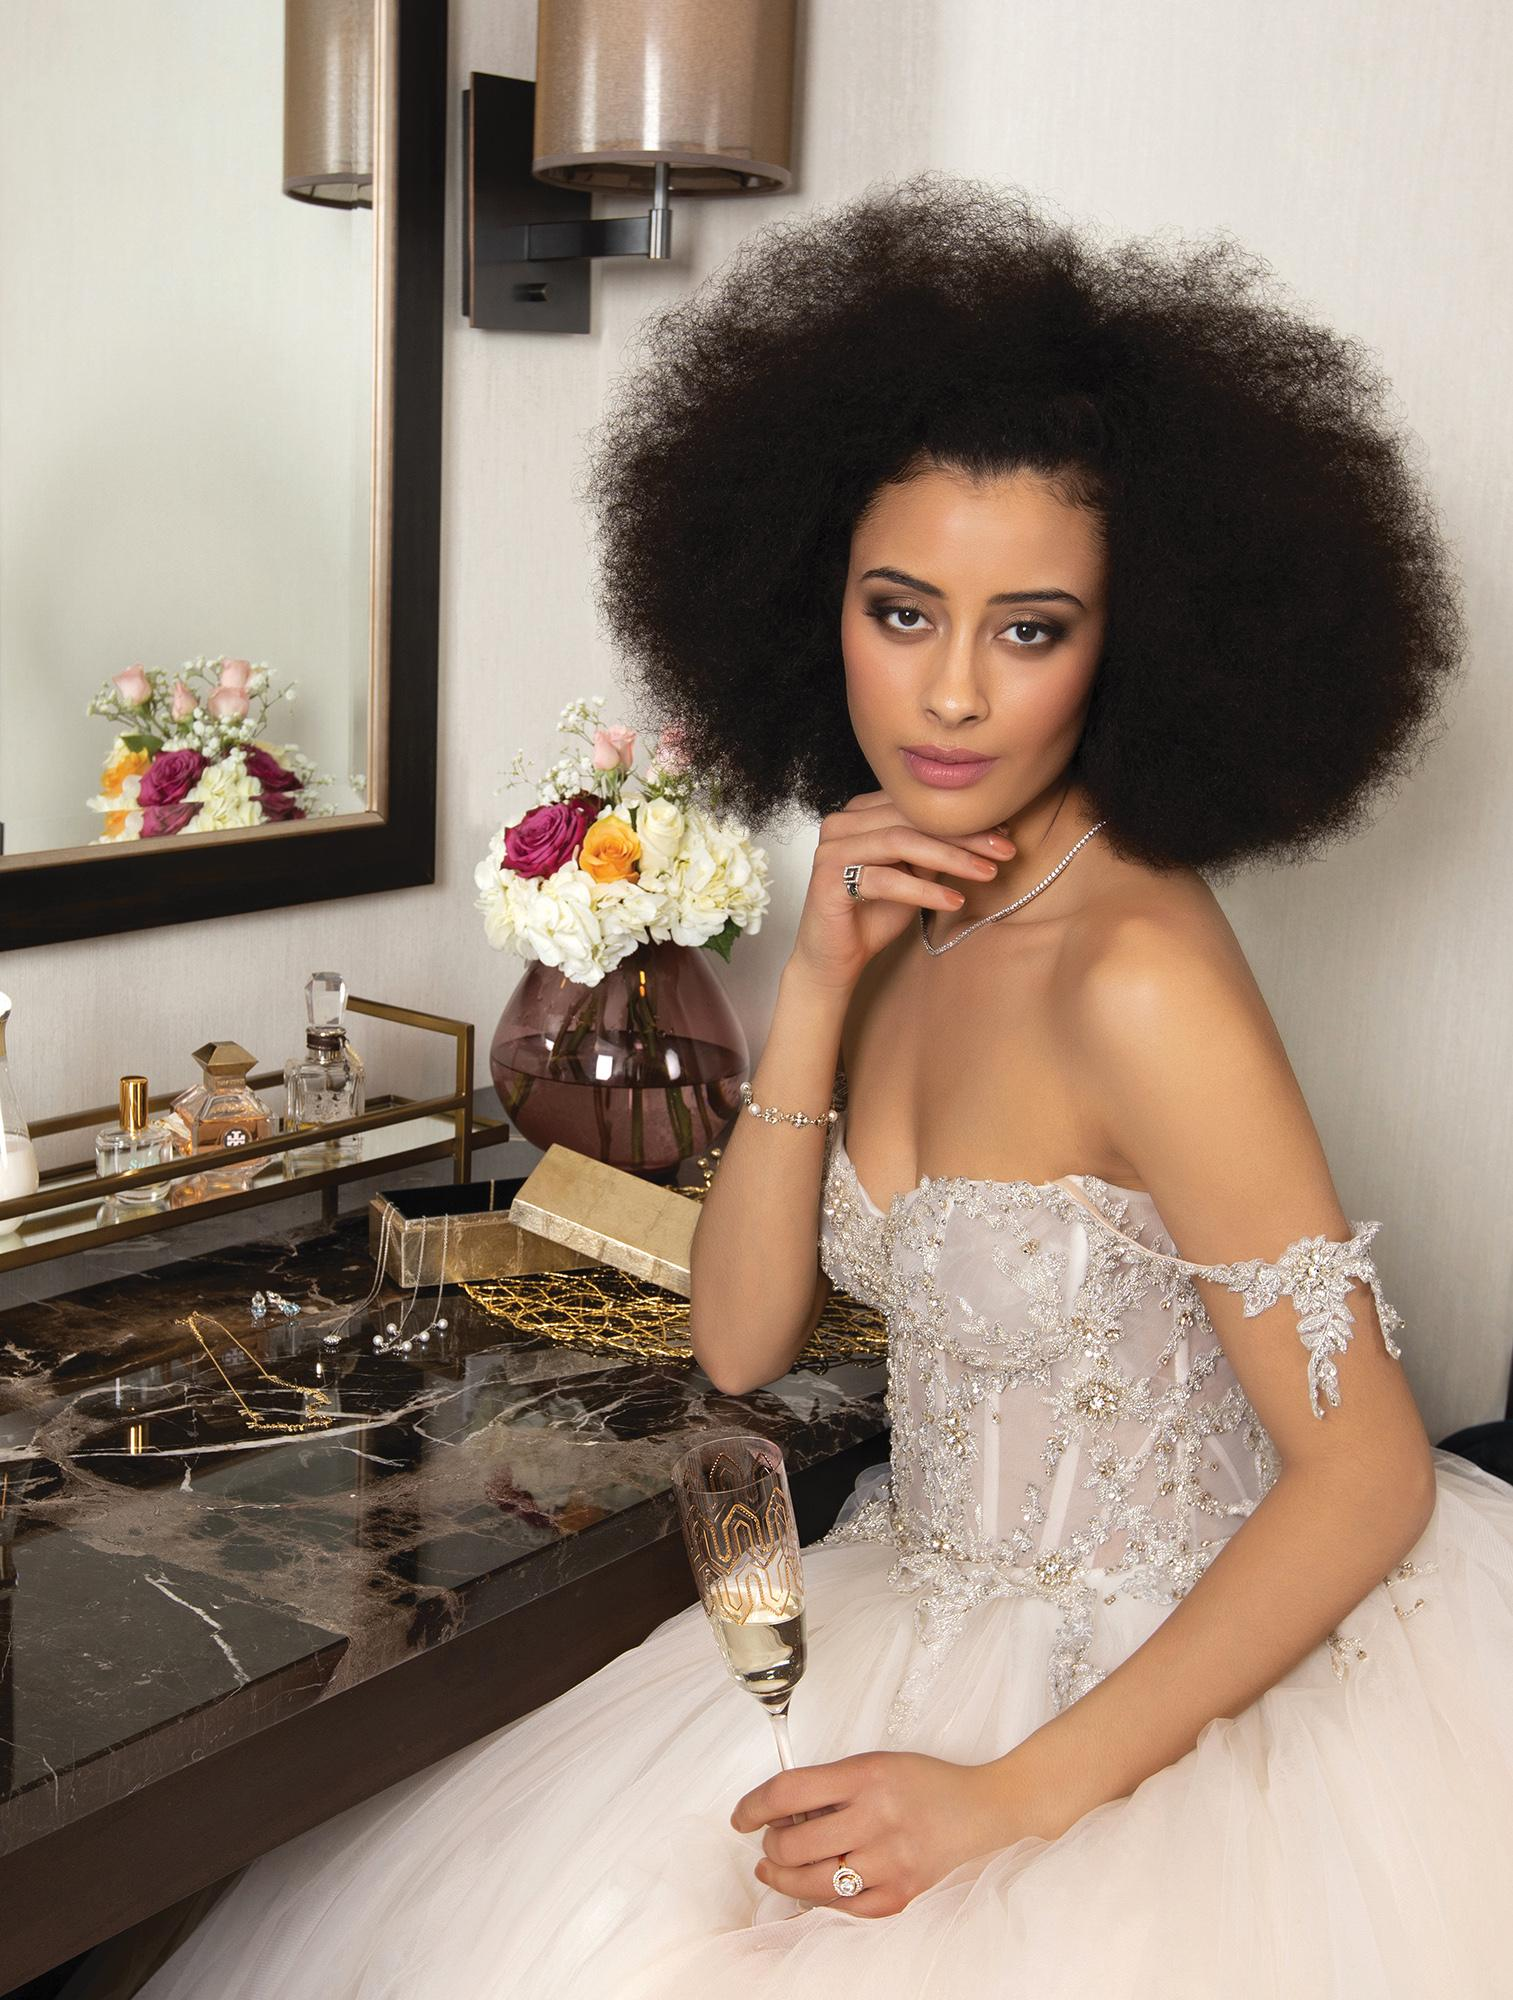 haute in the City | Bridal Fashion Shoot | Bridal Fashion | Menswear | Bride | Chicago Fashion Shoot